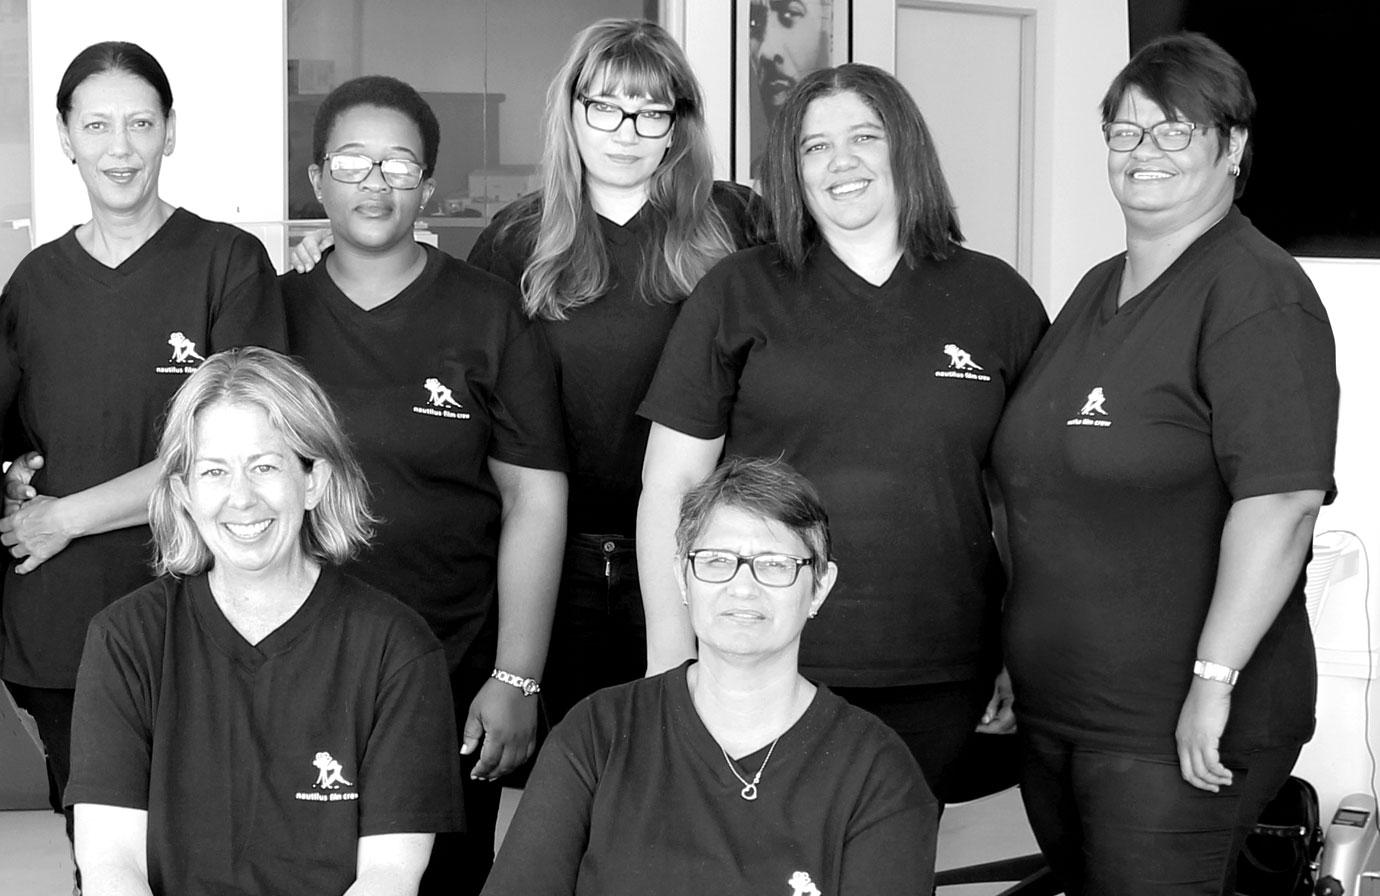 Team Nautilus - crew agents and accounts team